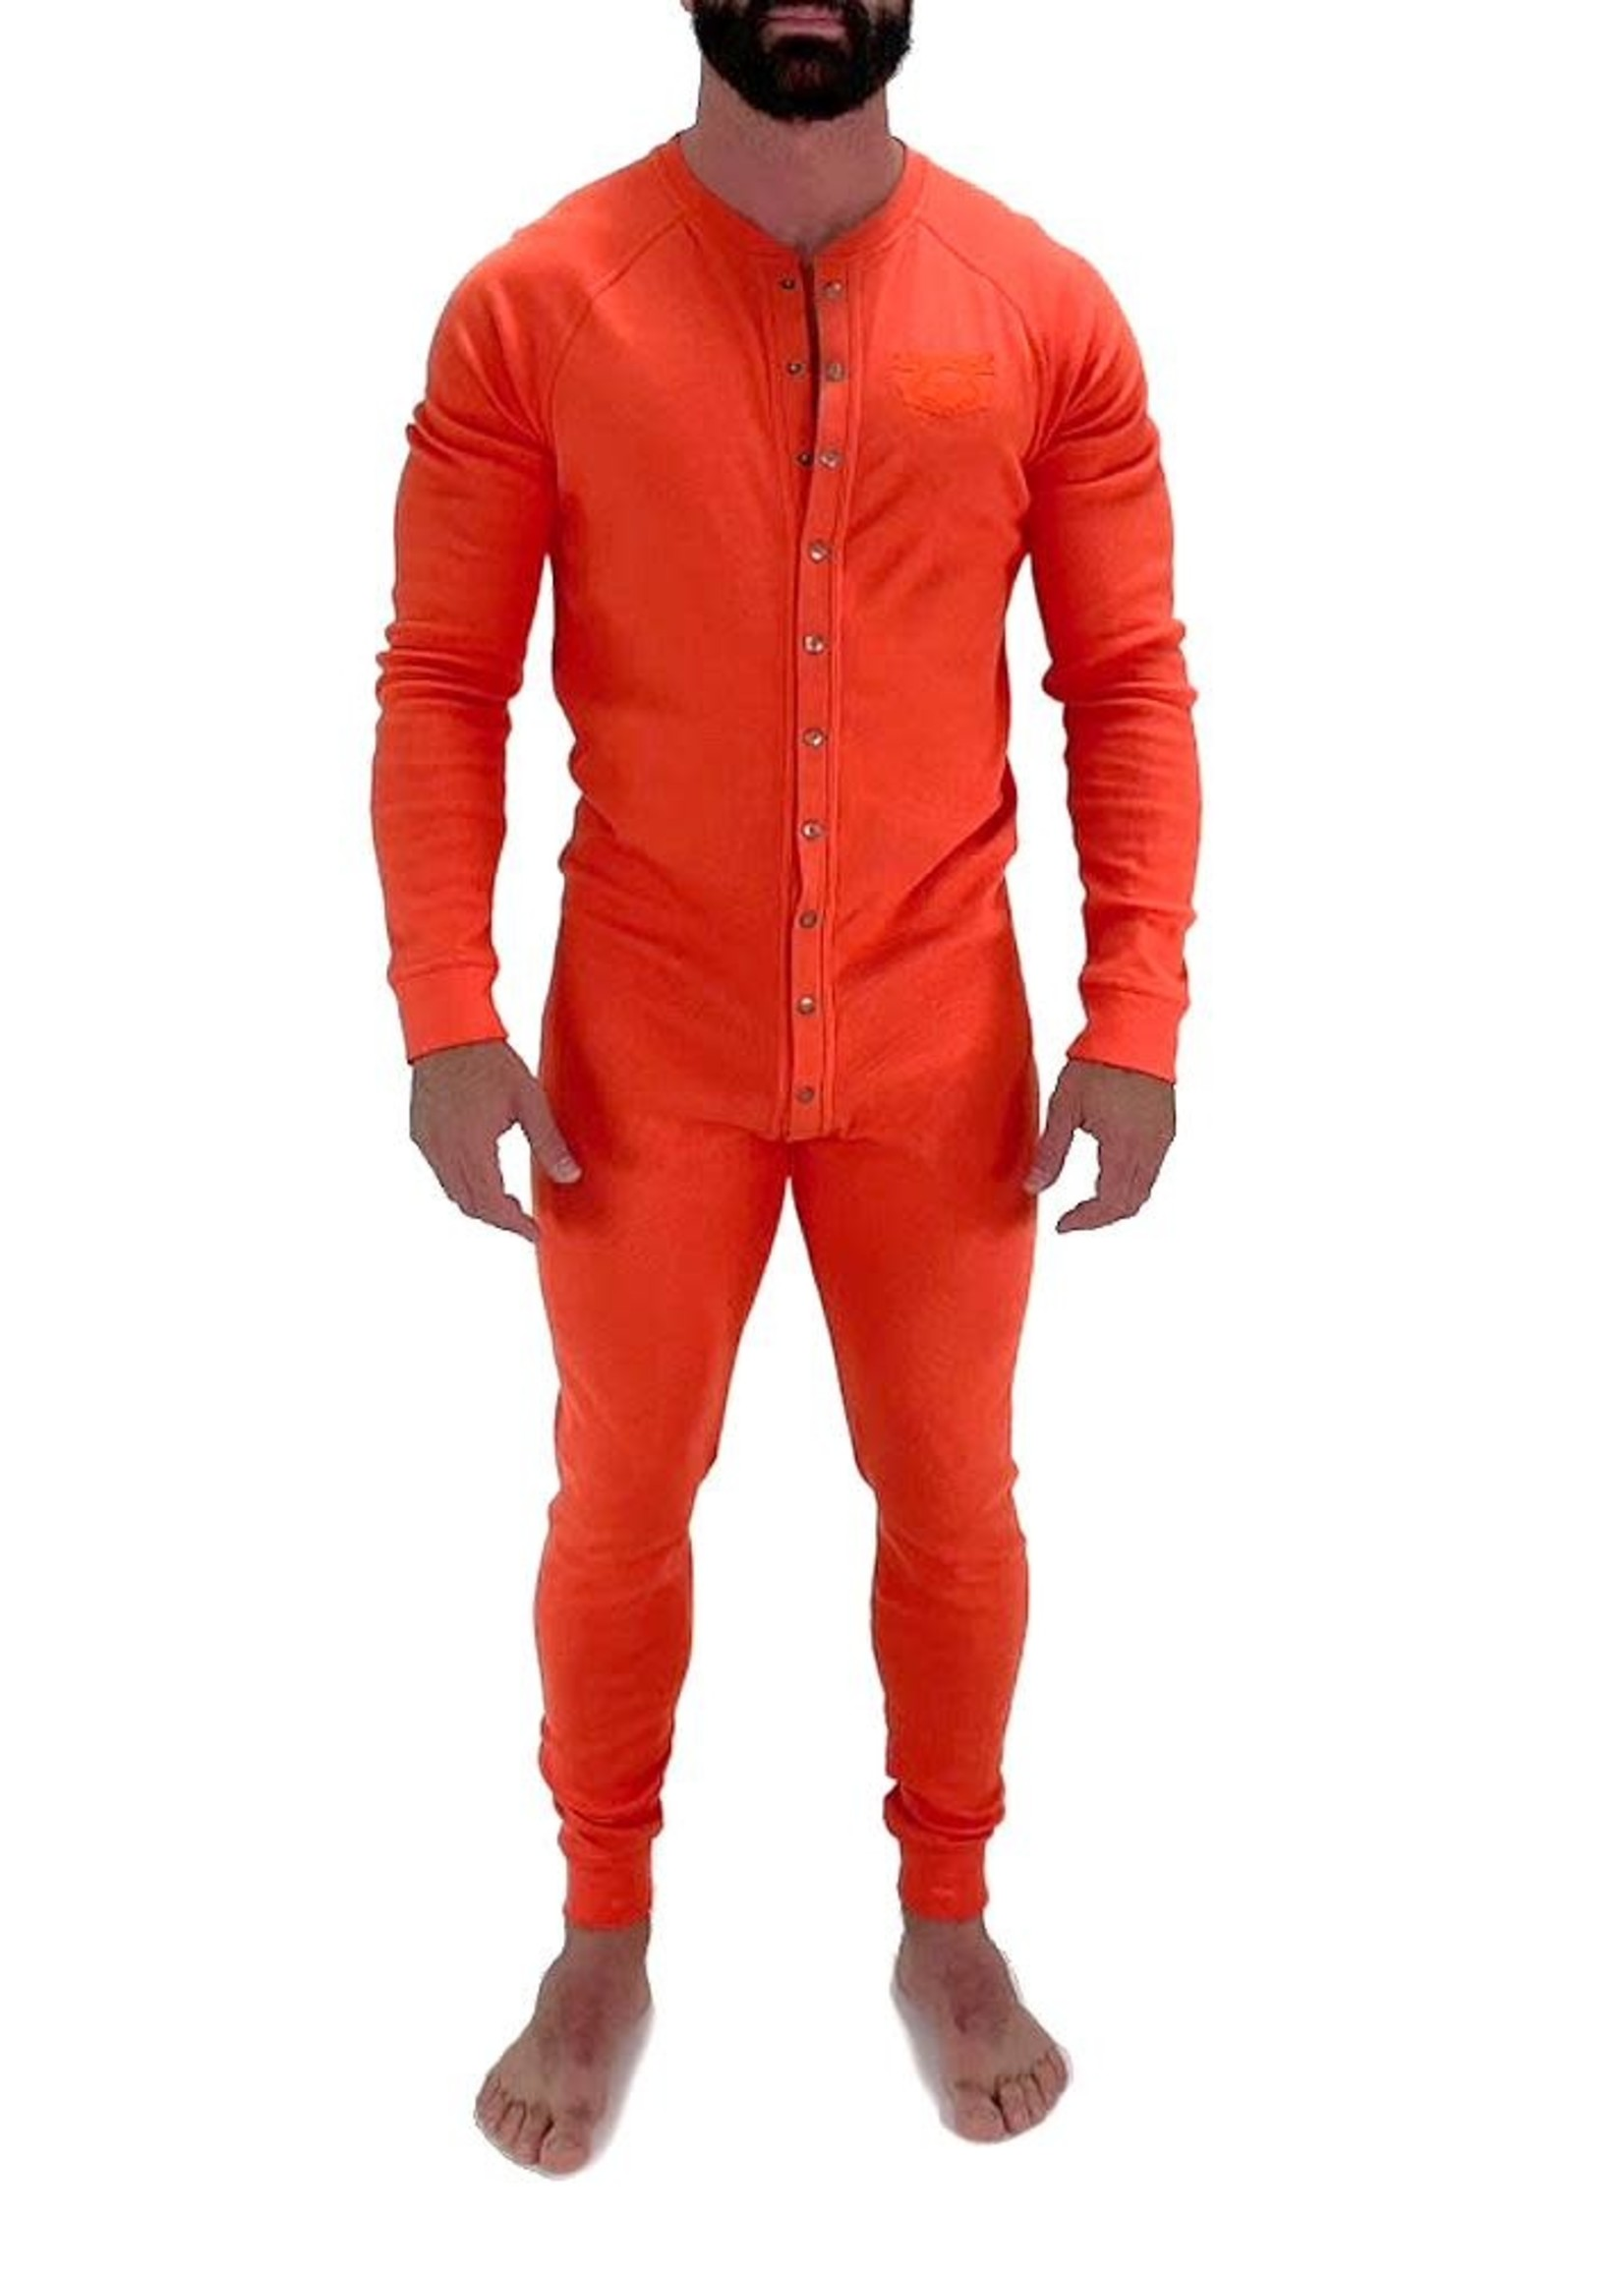 Nasty Pig Nasty Pig Union Suit